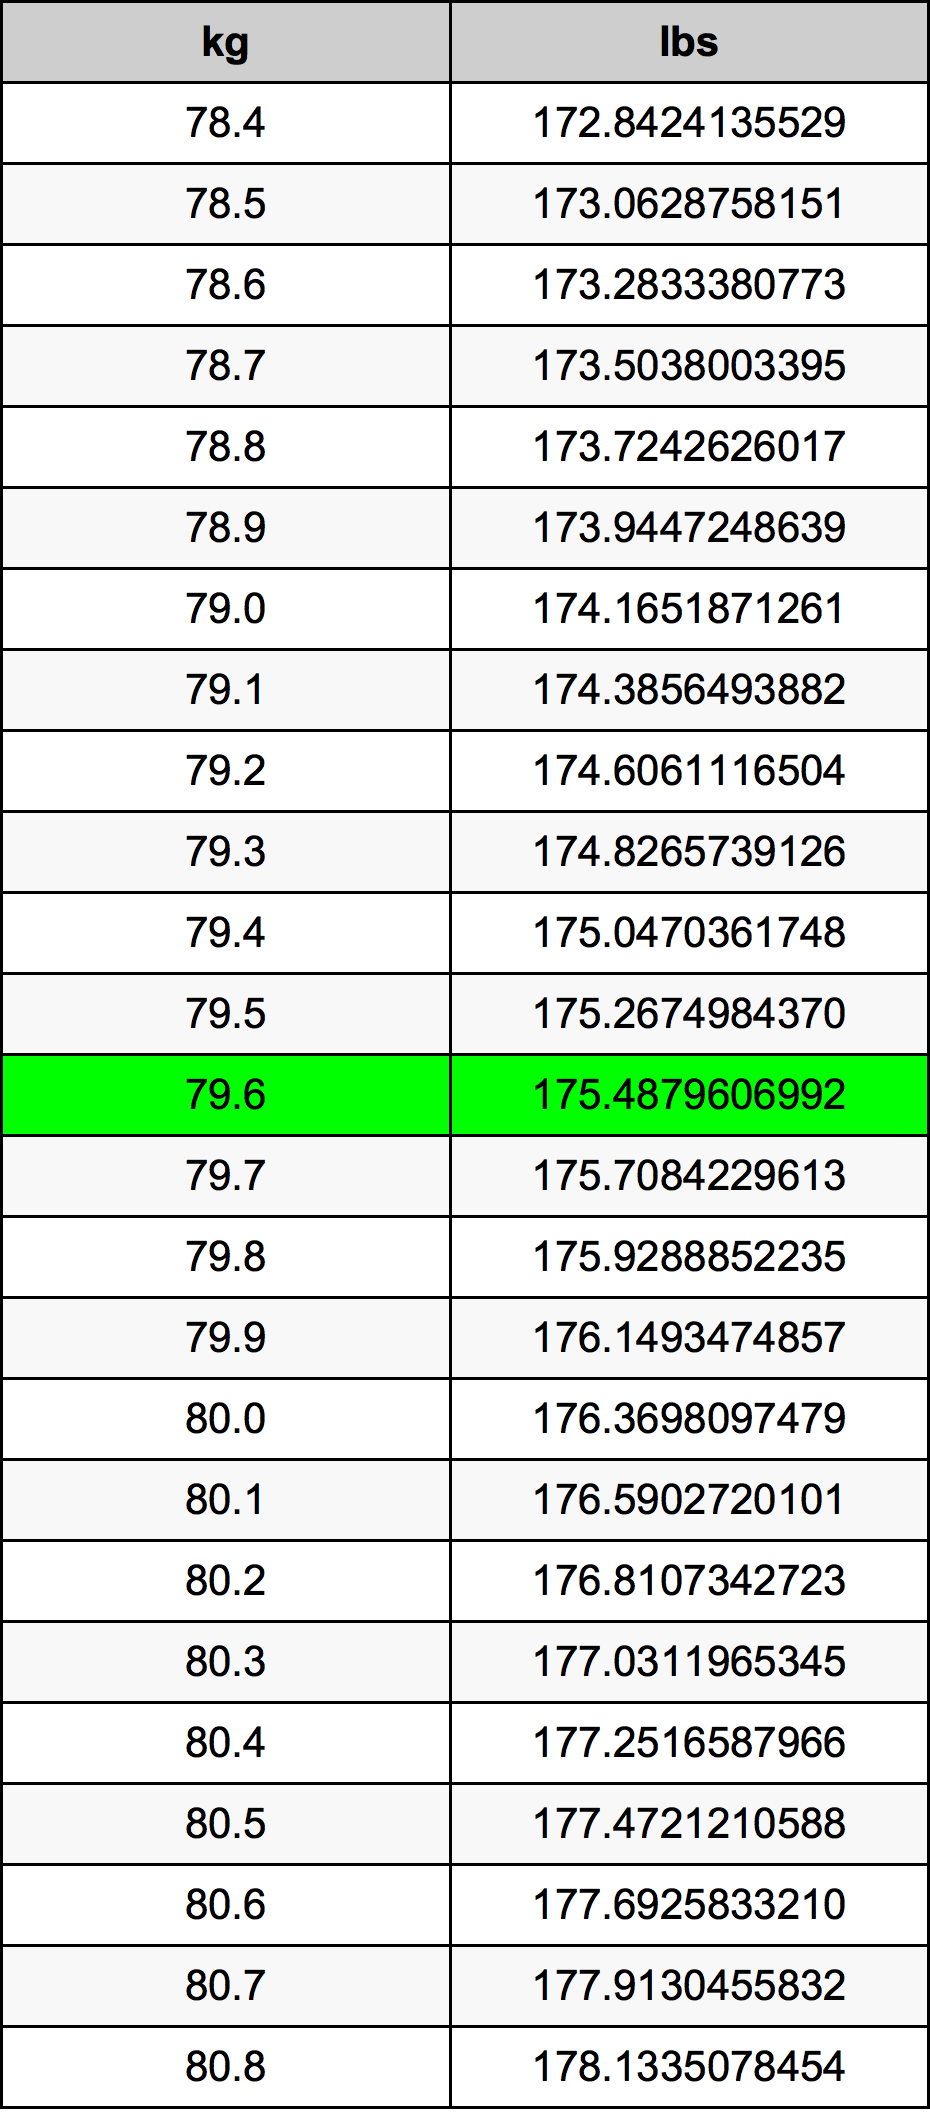 79.6 Kilogramma konverżjoni tabella